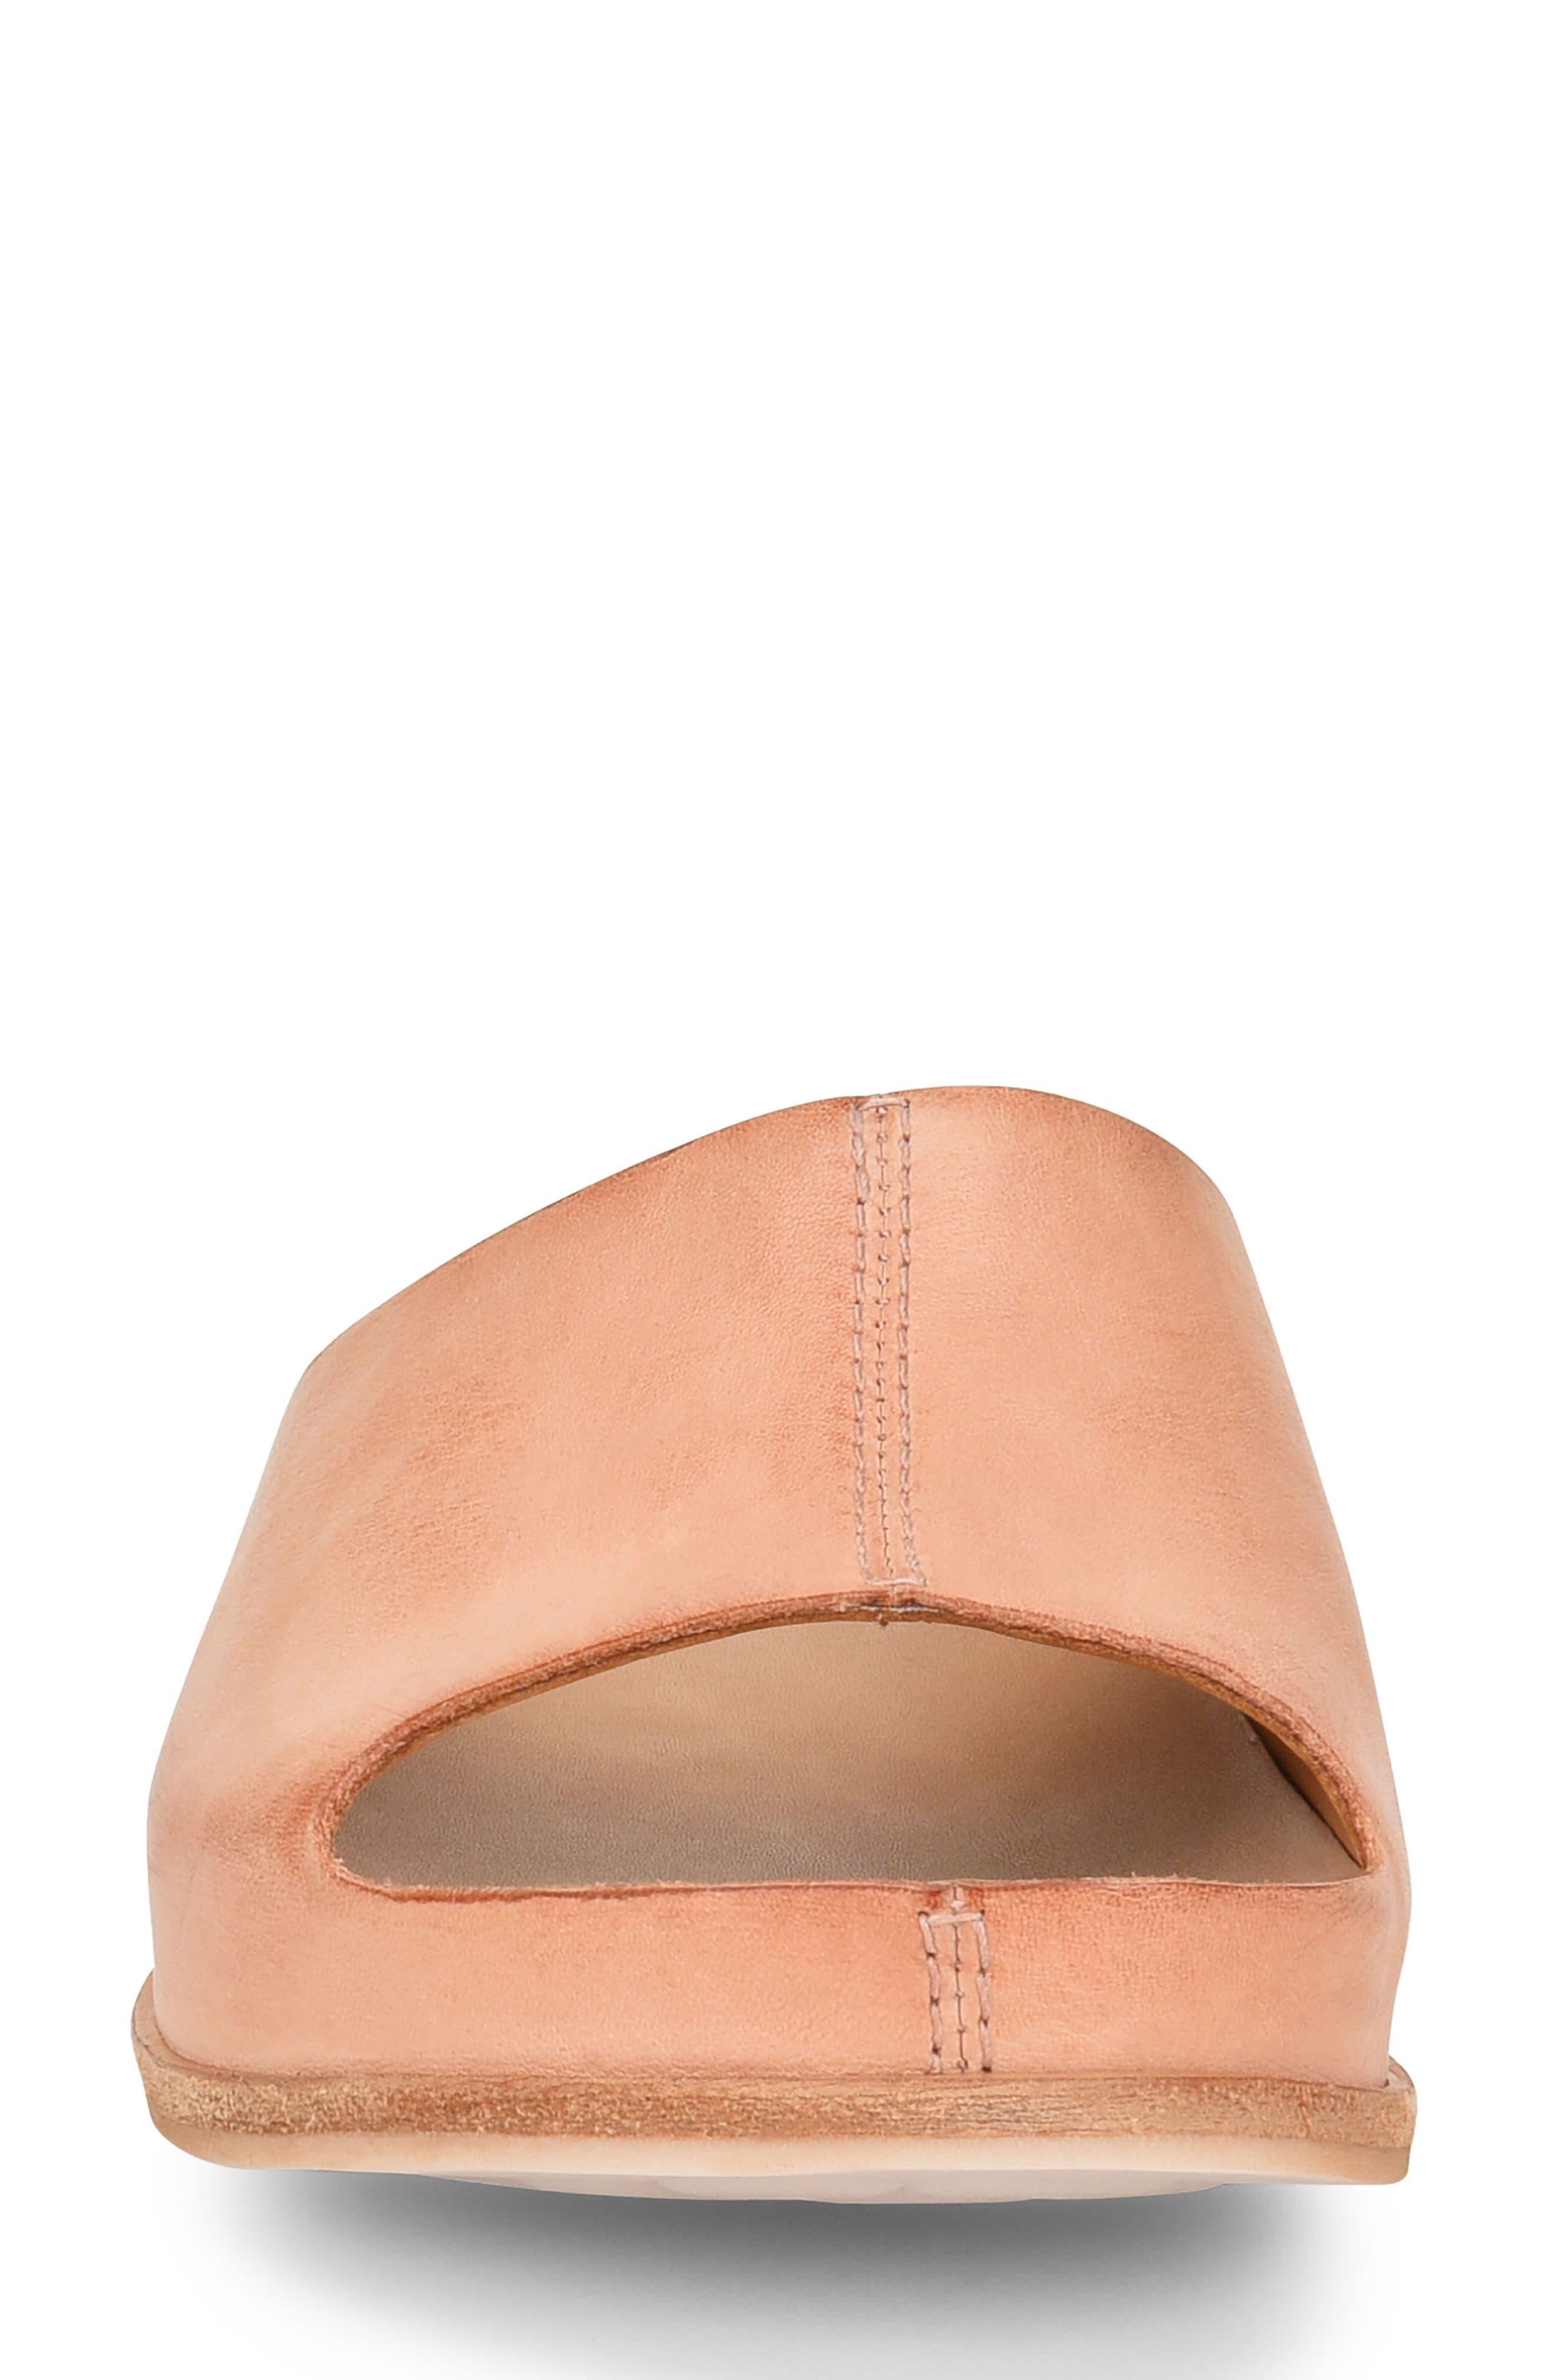 'Tutsi' Slide Sandal,                             Alternate thumbnail 4, color,                             Blush Leather